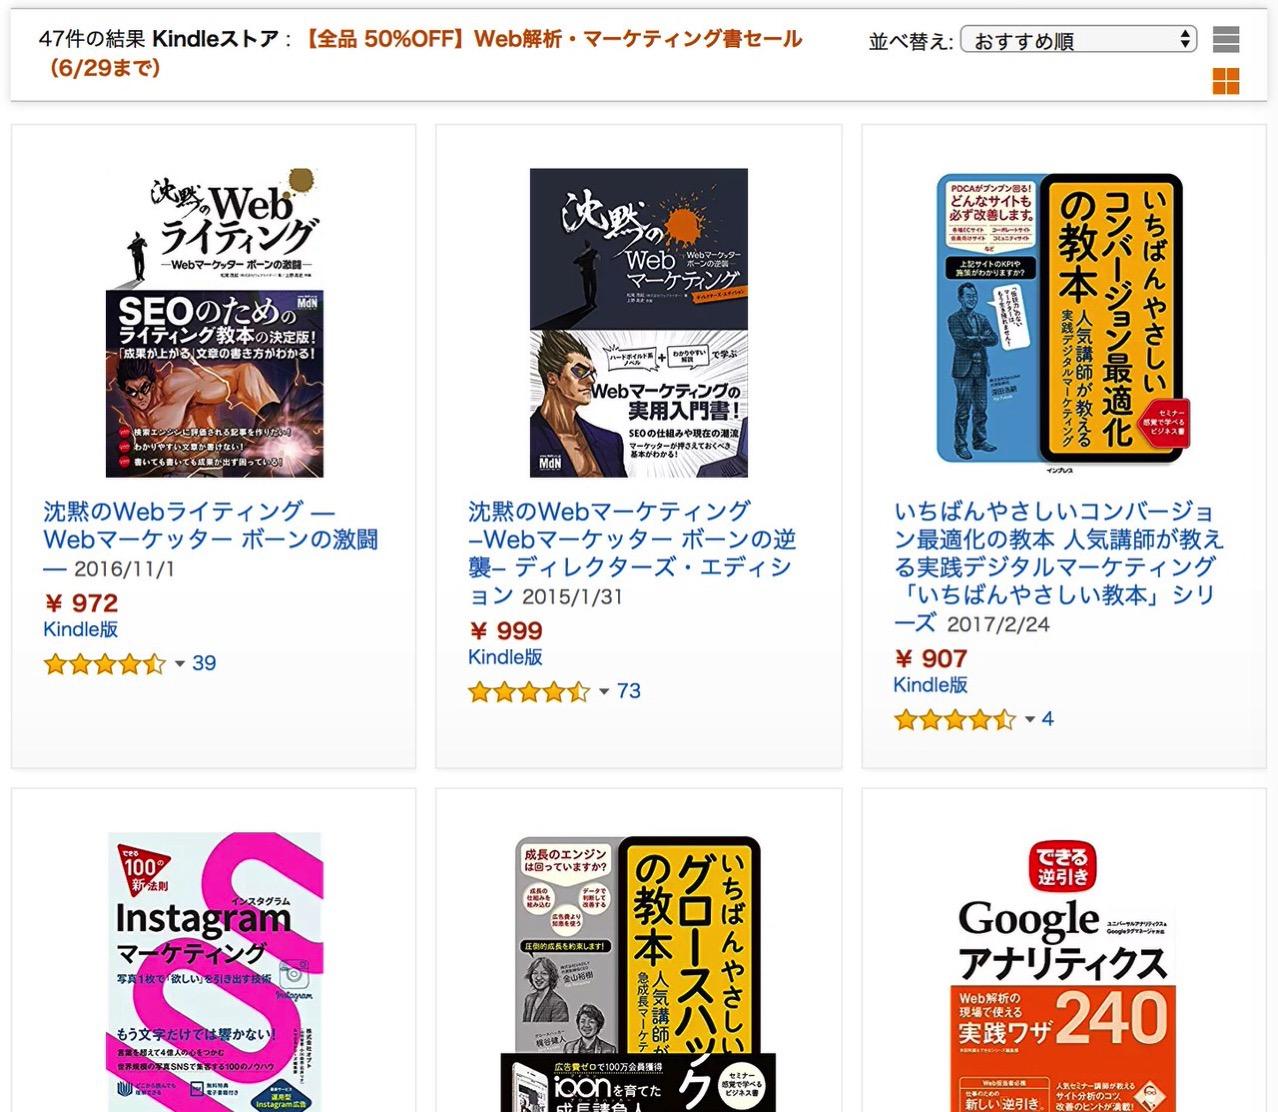 Kindle【全品50%OFF】Web解析・マーケティング書セール(6/29まで)